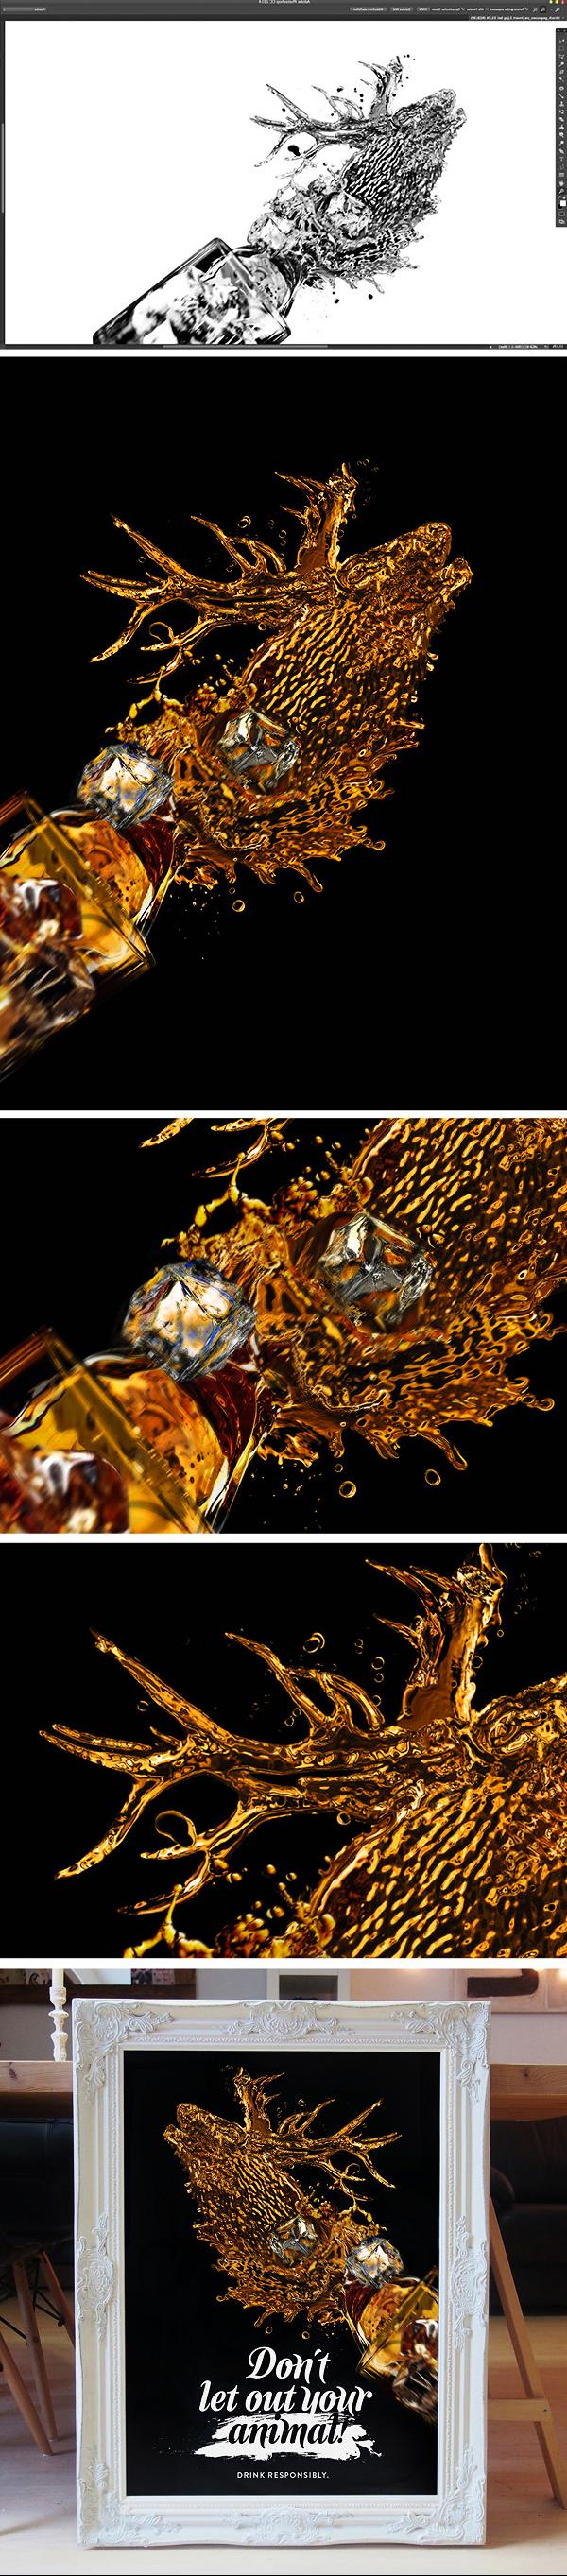 spirit Liquid deer horse franko schiermeyer gold animal drink responsibly